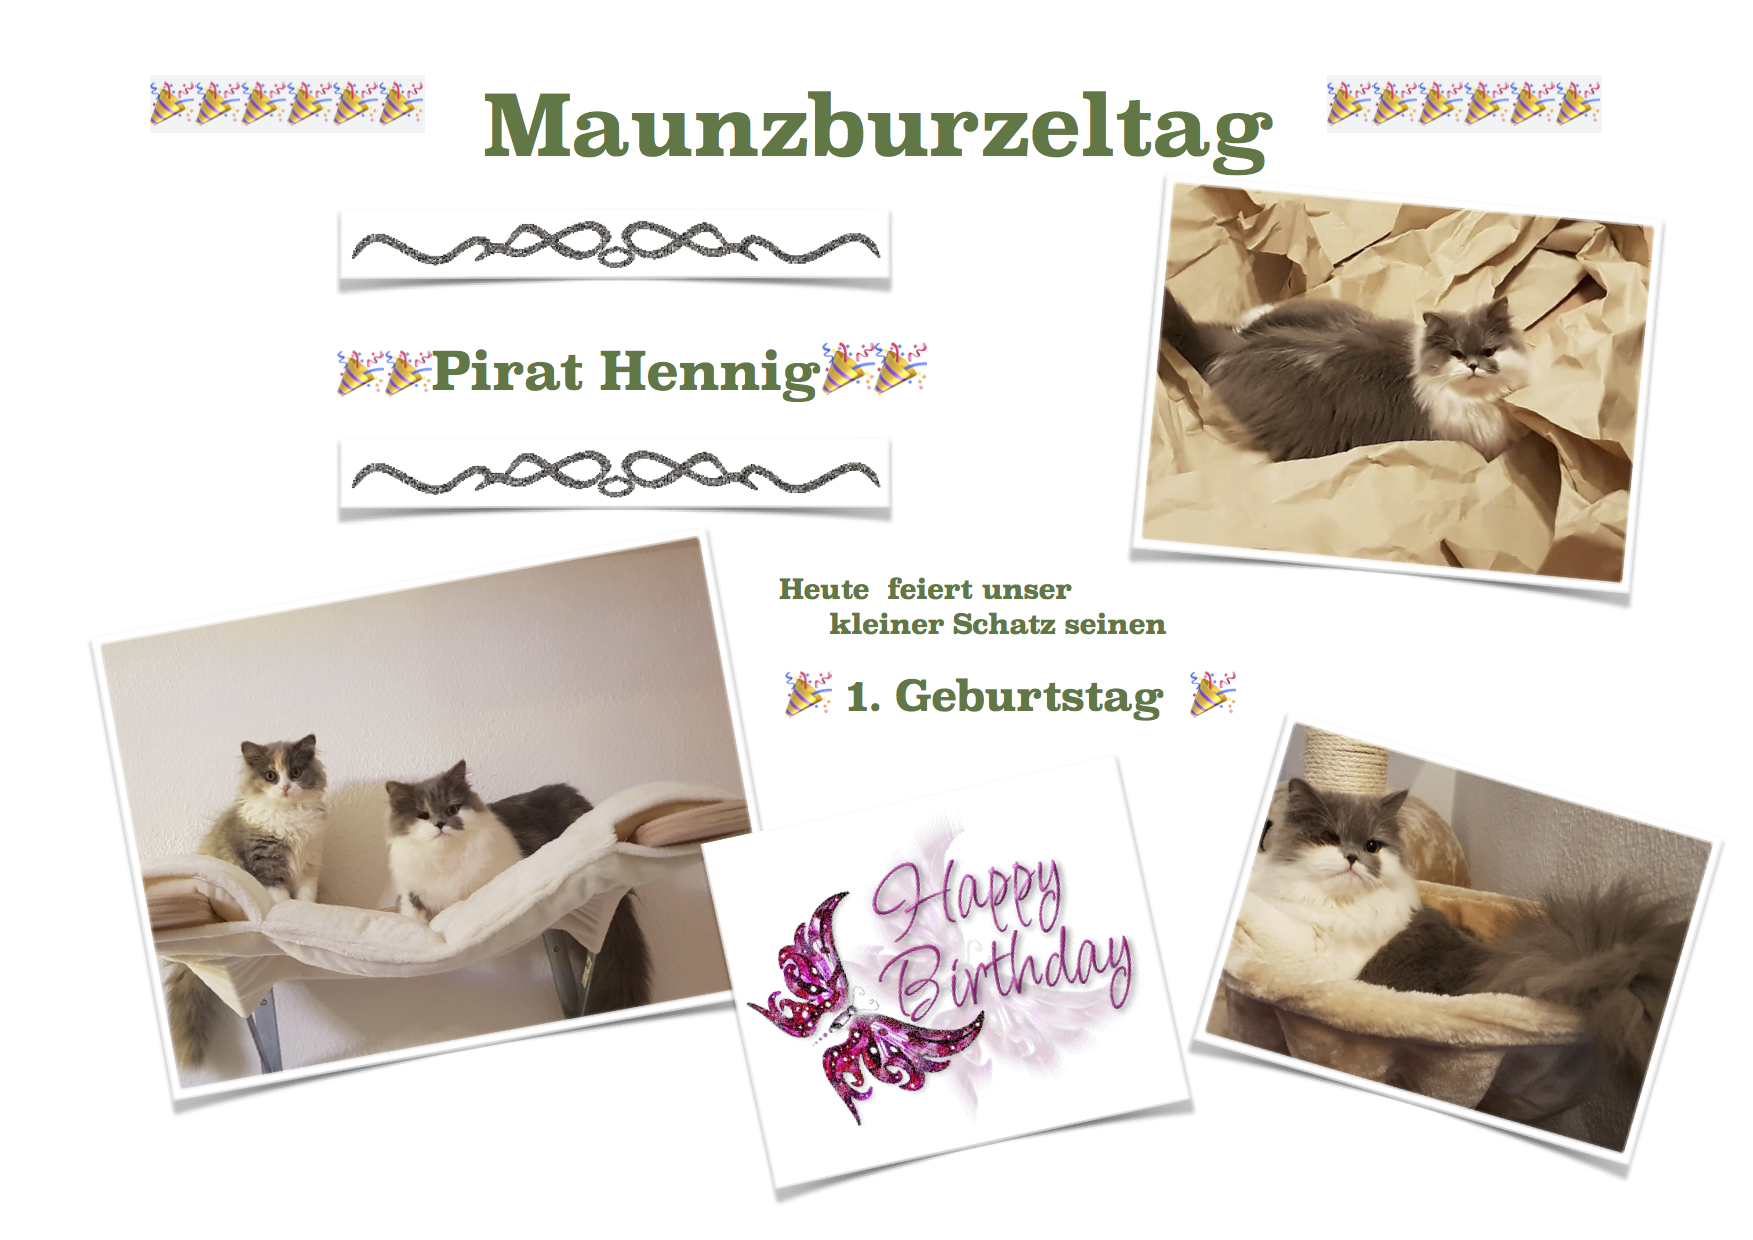 1. Geburtstag Hennig.jpg